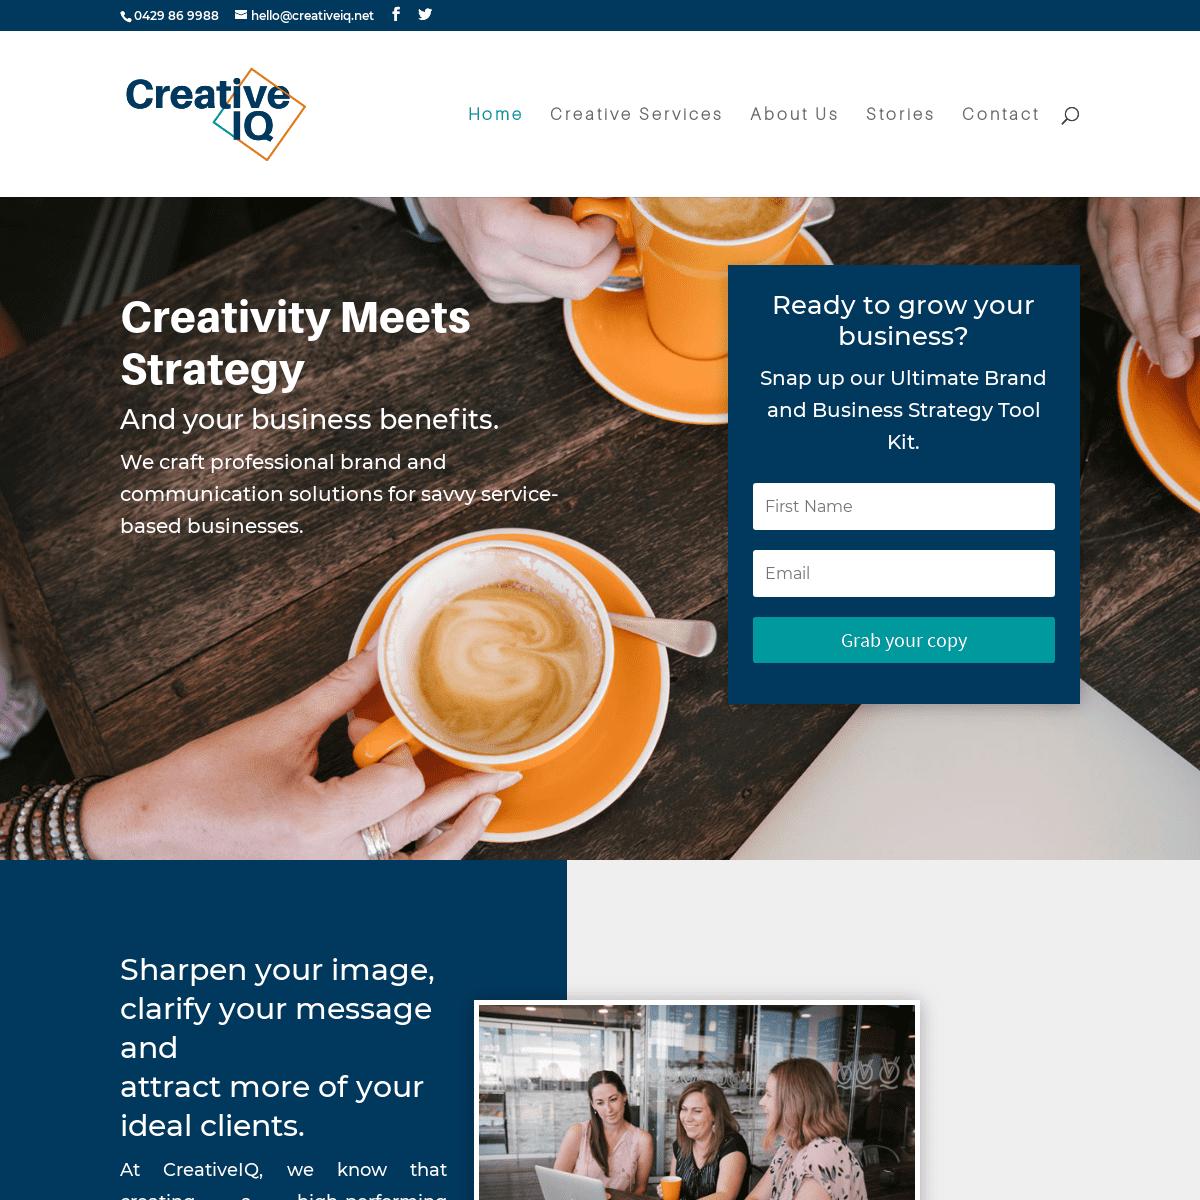 Branding & Communications Strategists - CreativeIQ